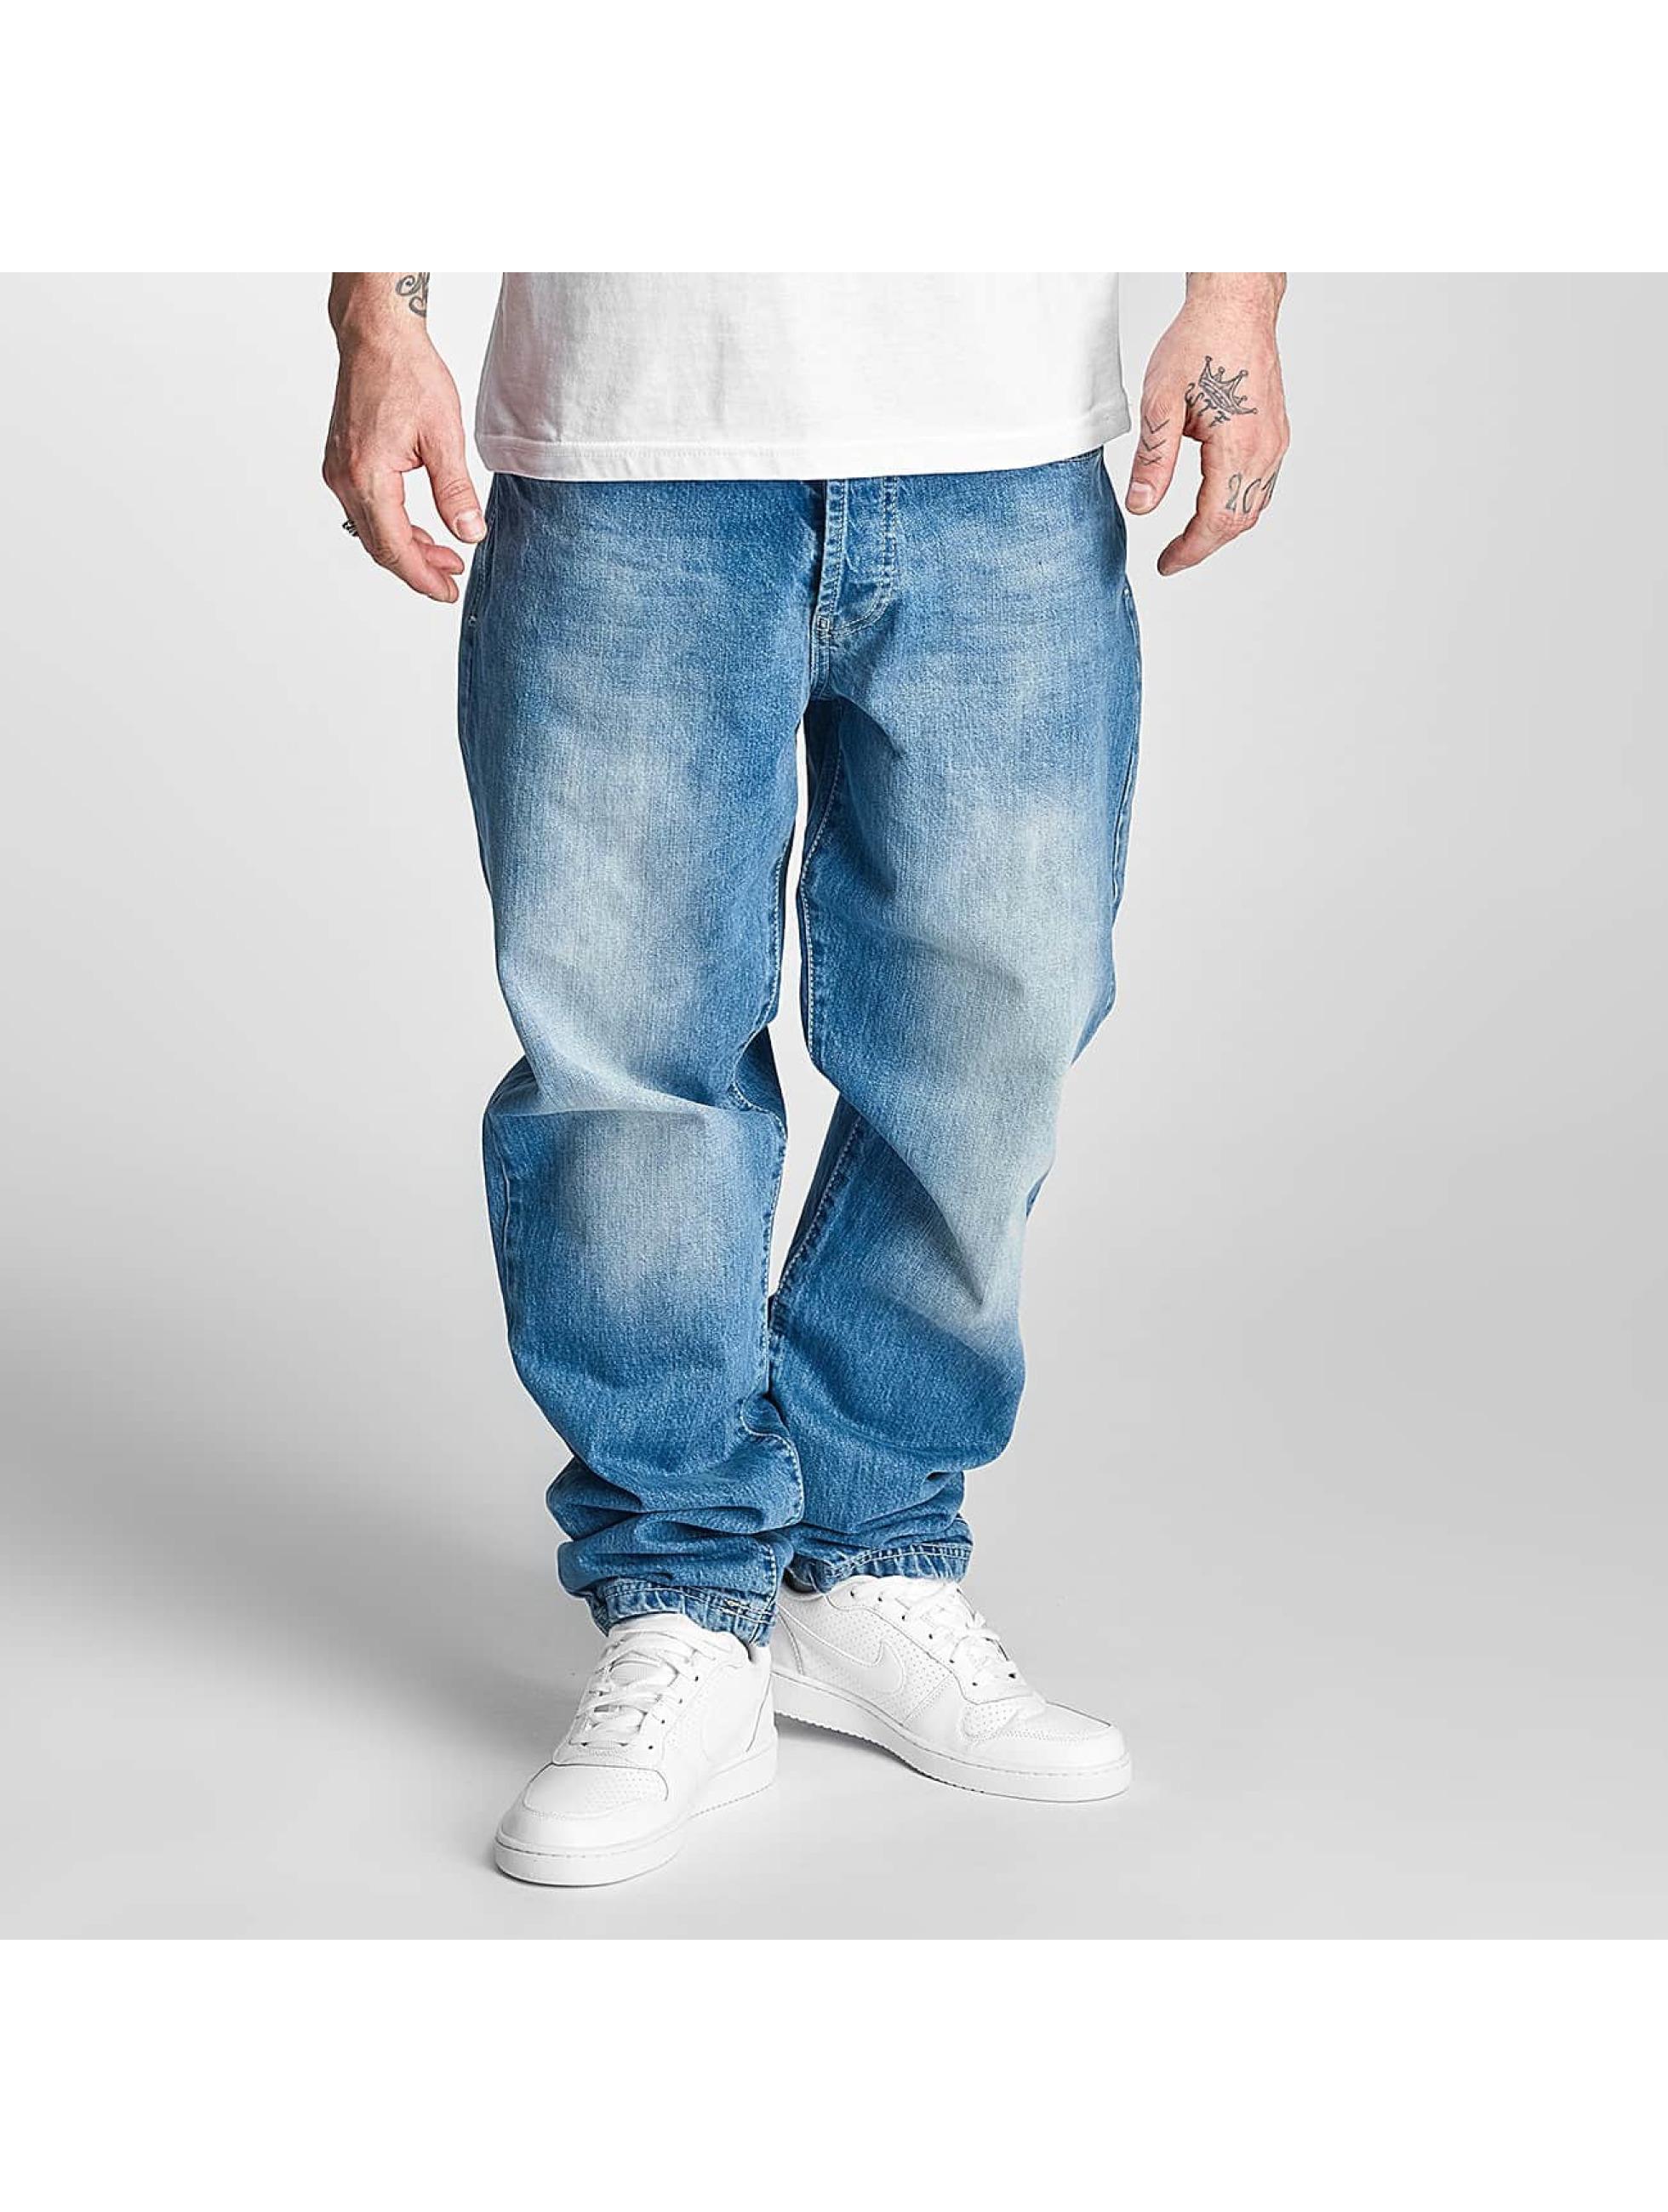 Thug Life Baggy Toljatti blue